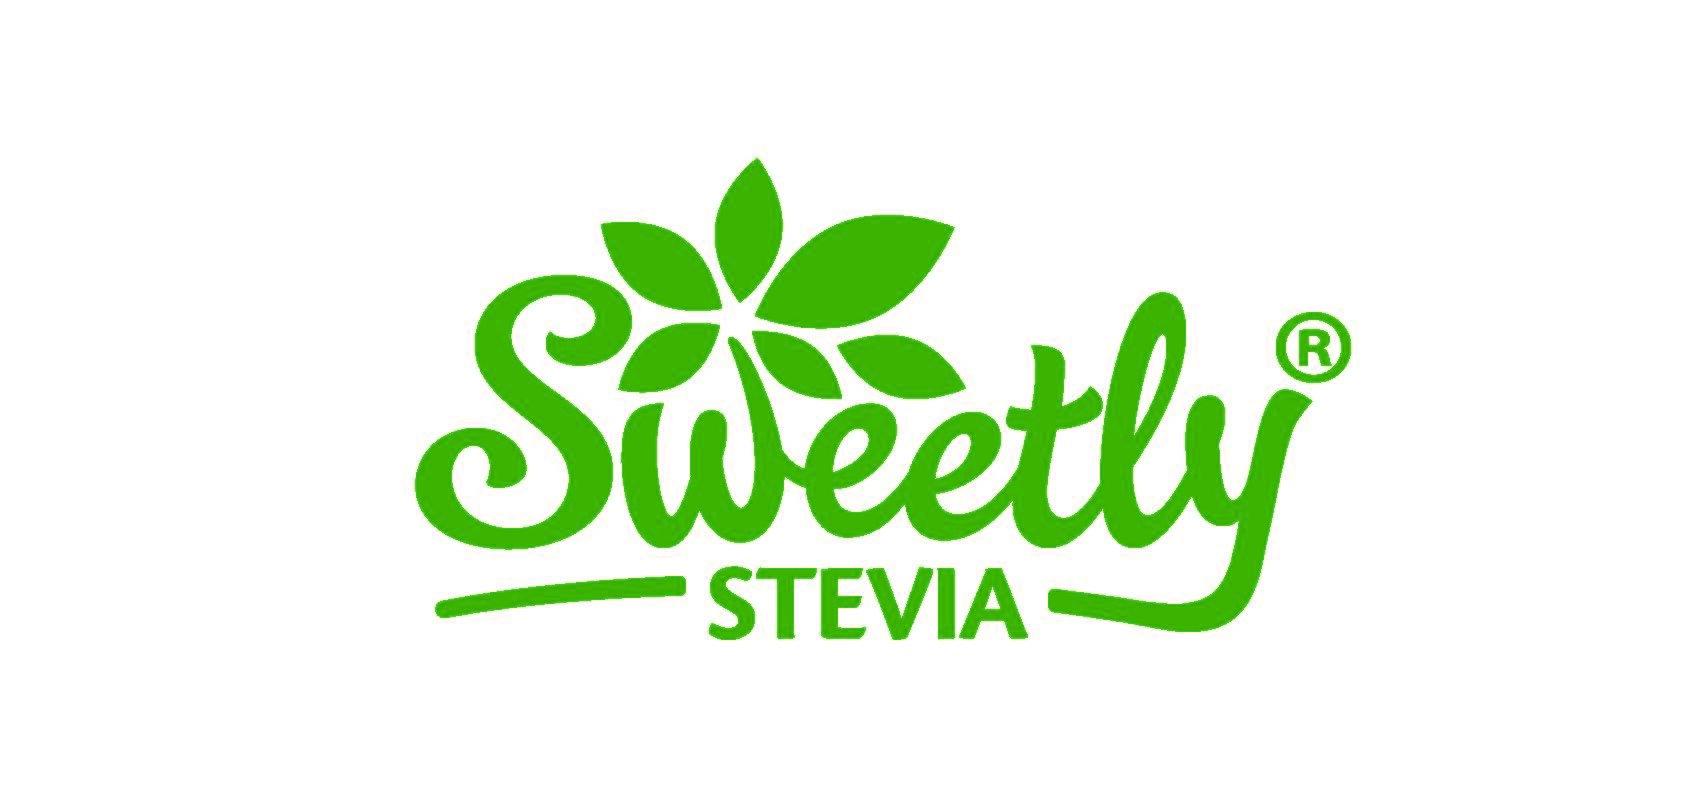 Sweetly_logo_green.jpg